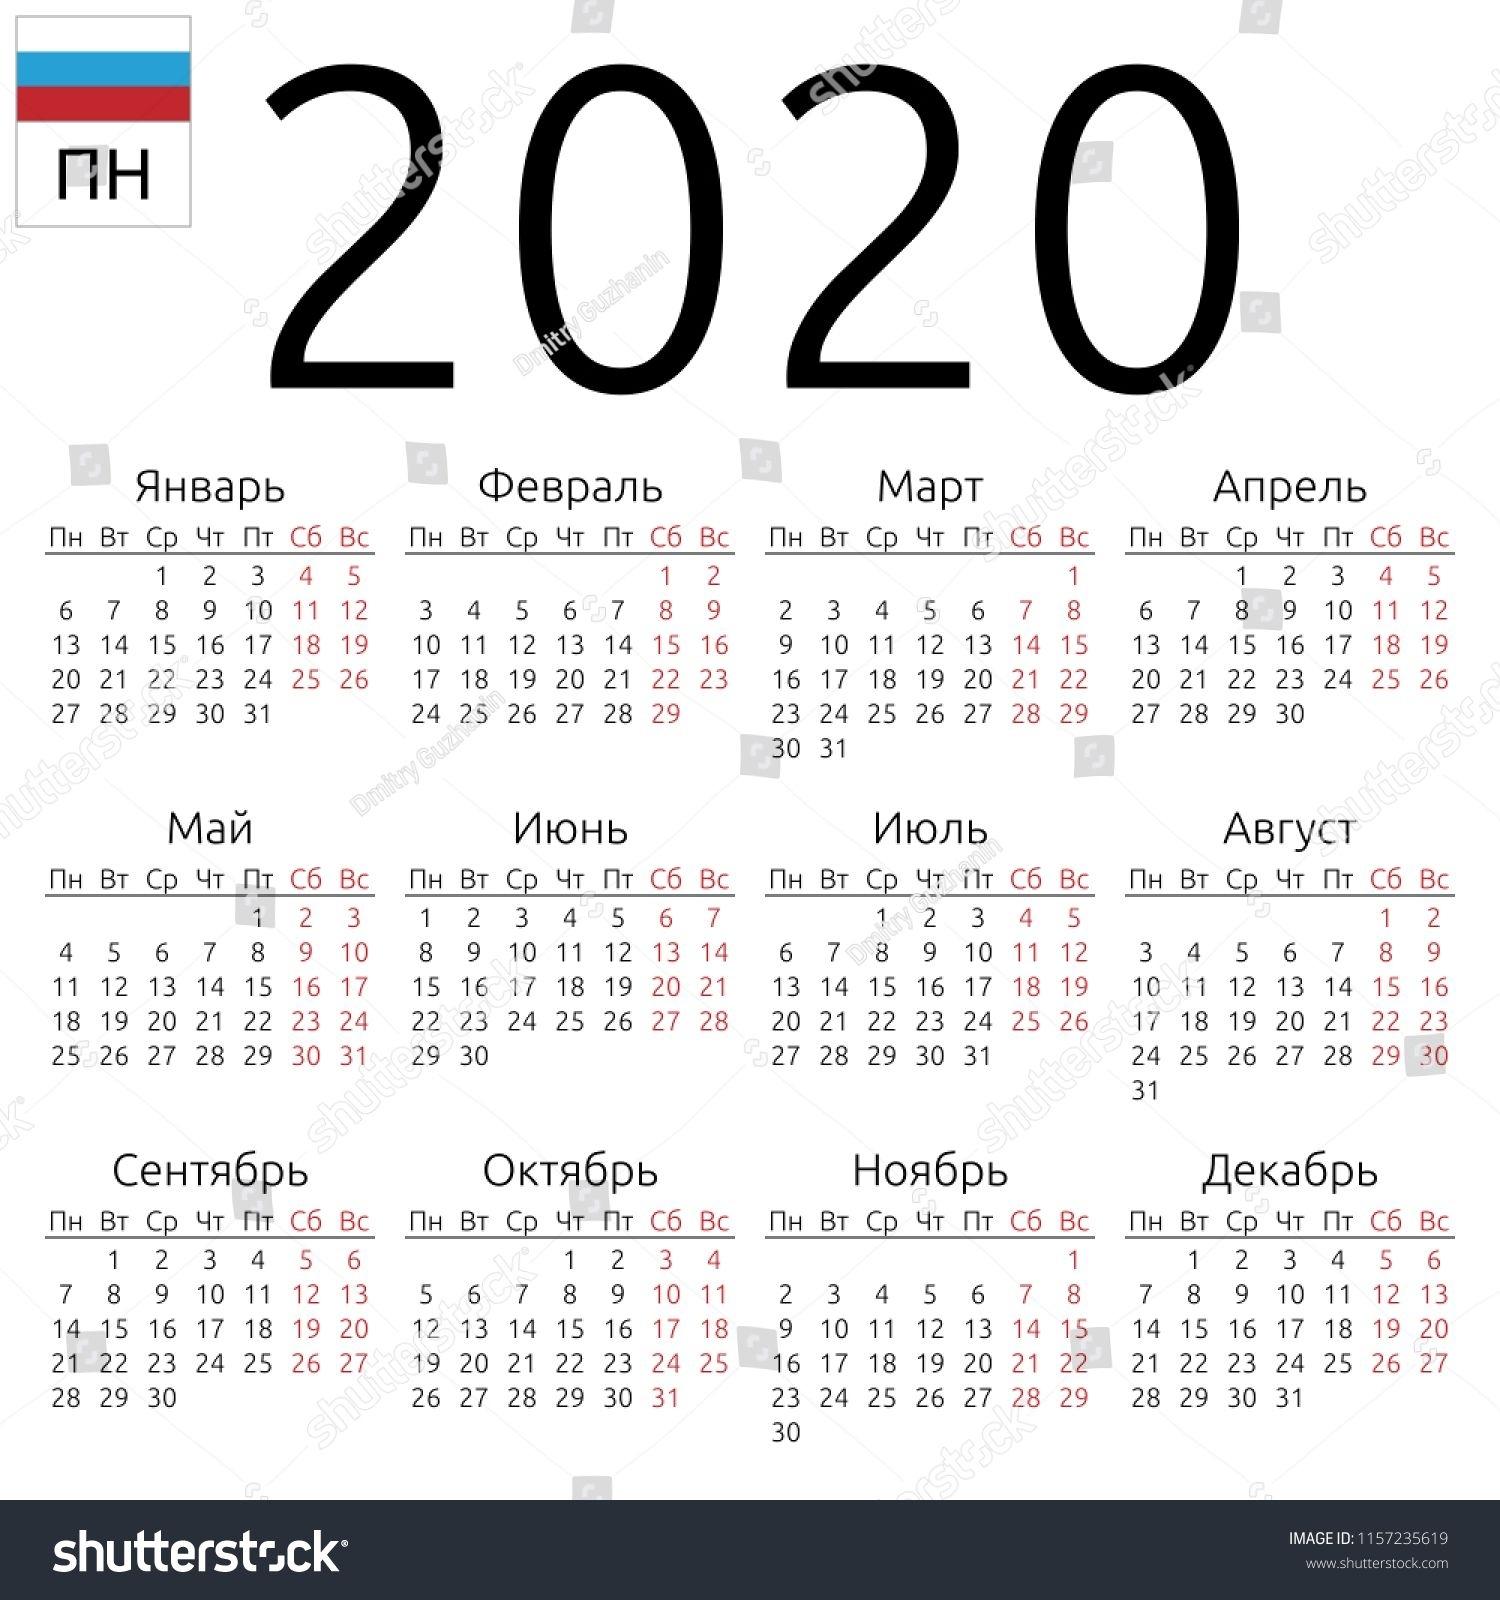 Simple Annual 2020 Year Wall Calendar. Russian Language